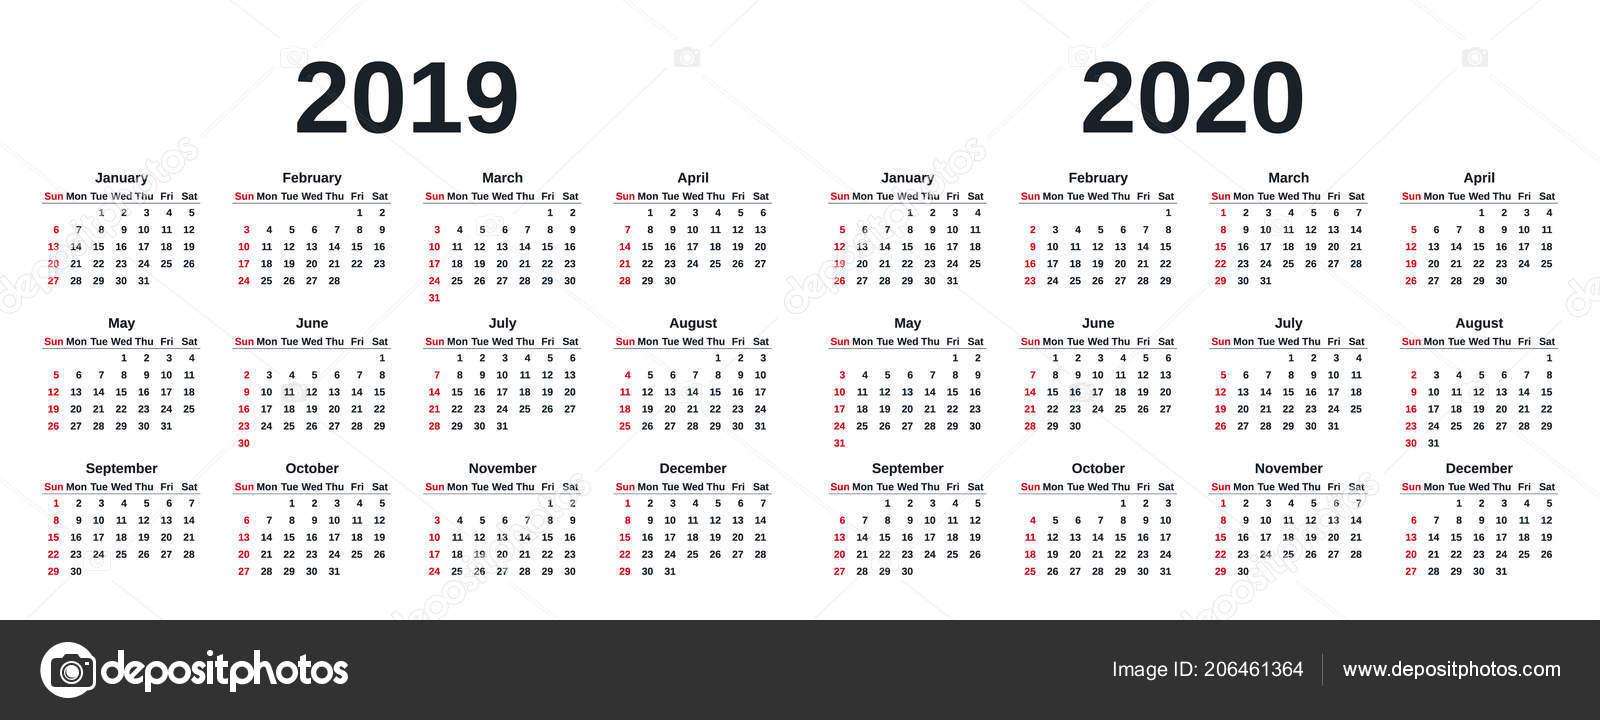 2020 Calendar By Week